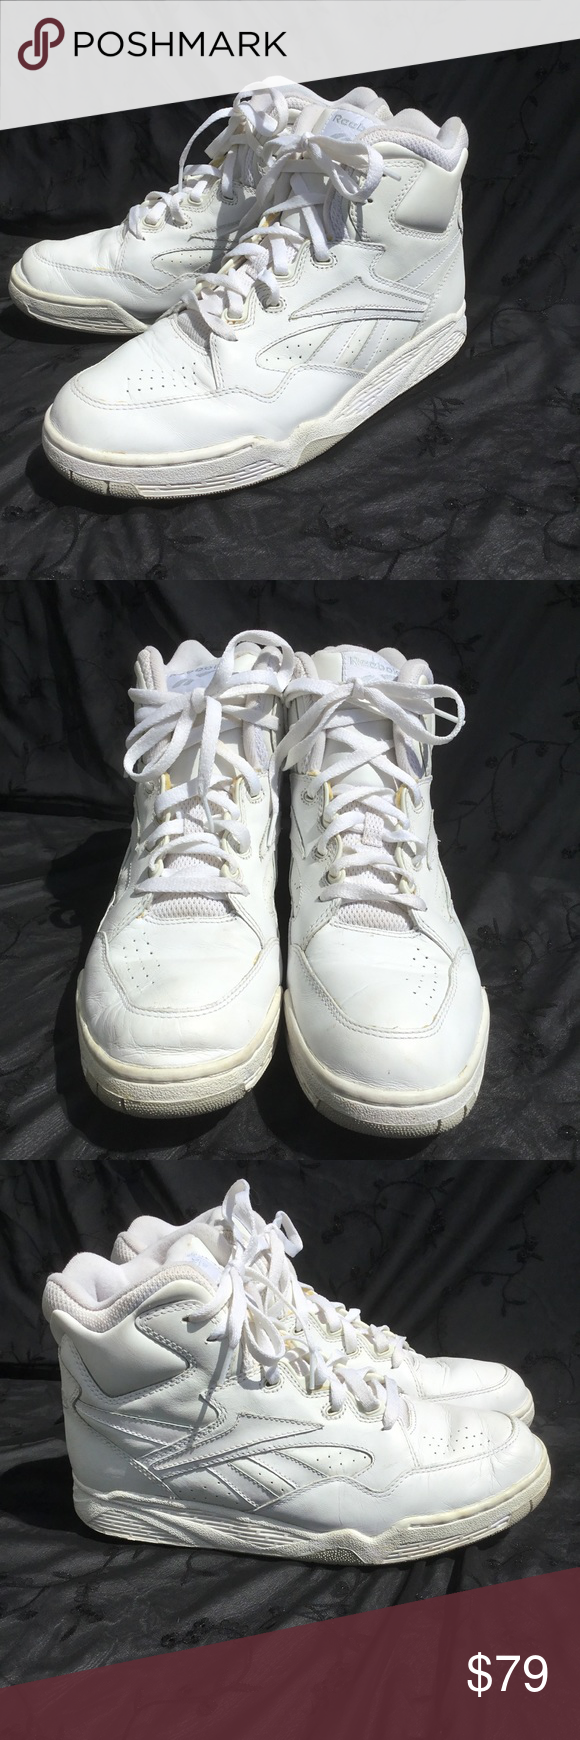 9361edccf7432 Vintage retro reebok men s high tops Sz 10 Reebok vintage white mens  athletic high top shoes size 10. Great condition. Reebok Shoes Athletic  Shoes